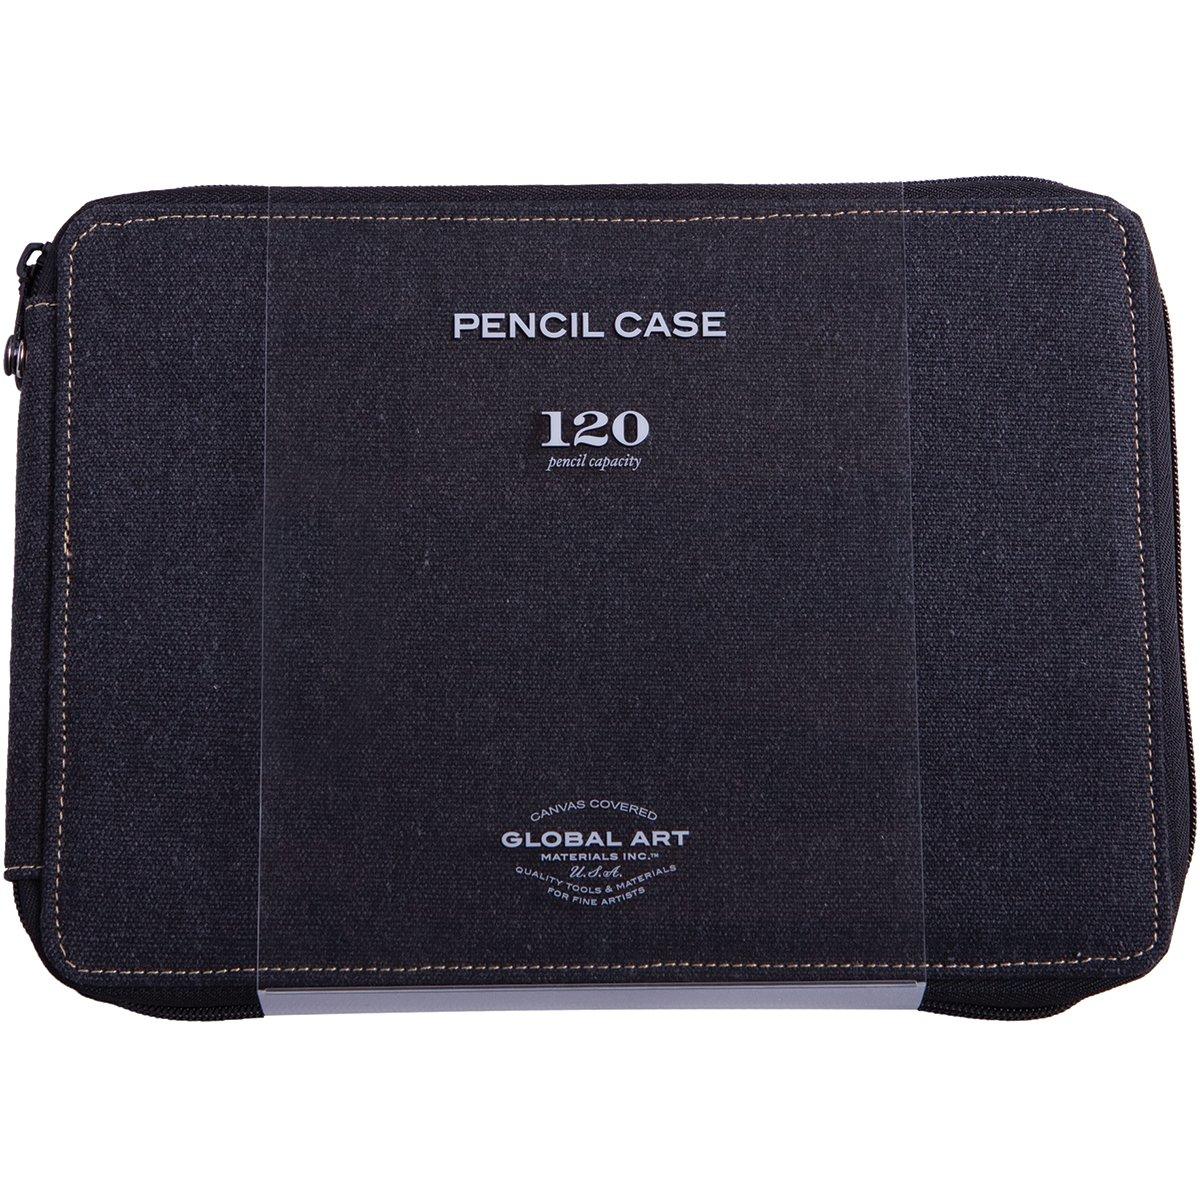 Global Art Canvas 120 Pencil Case Black